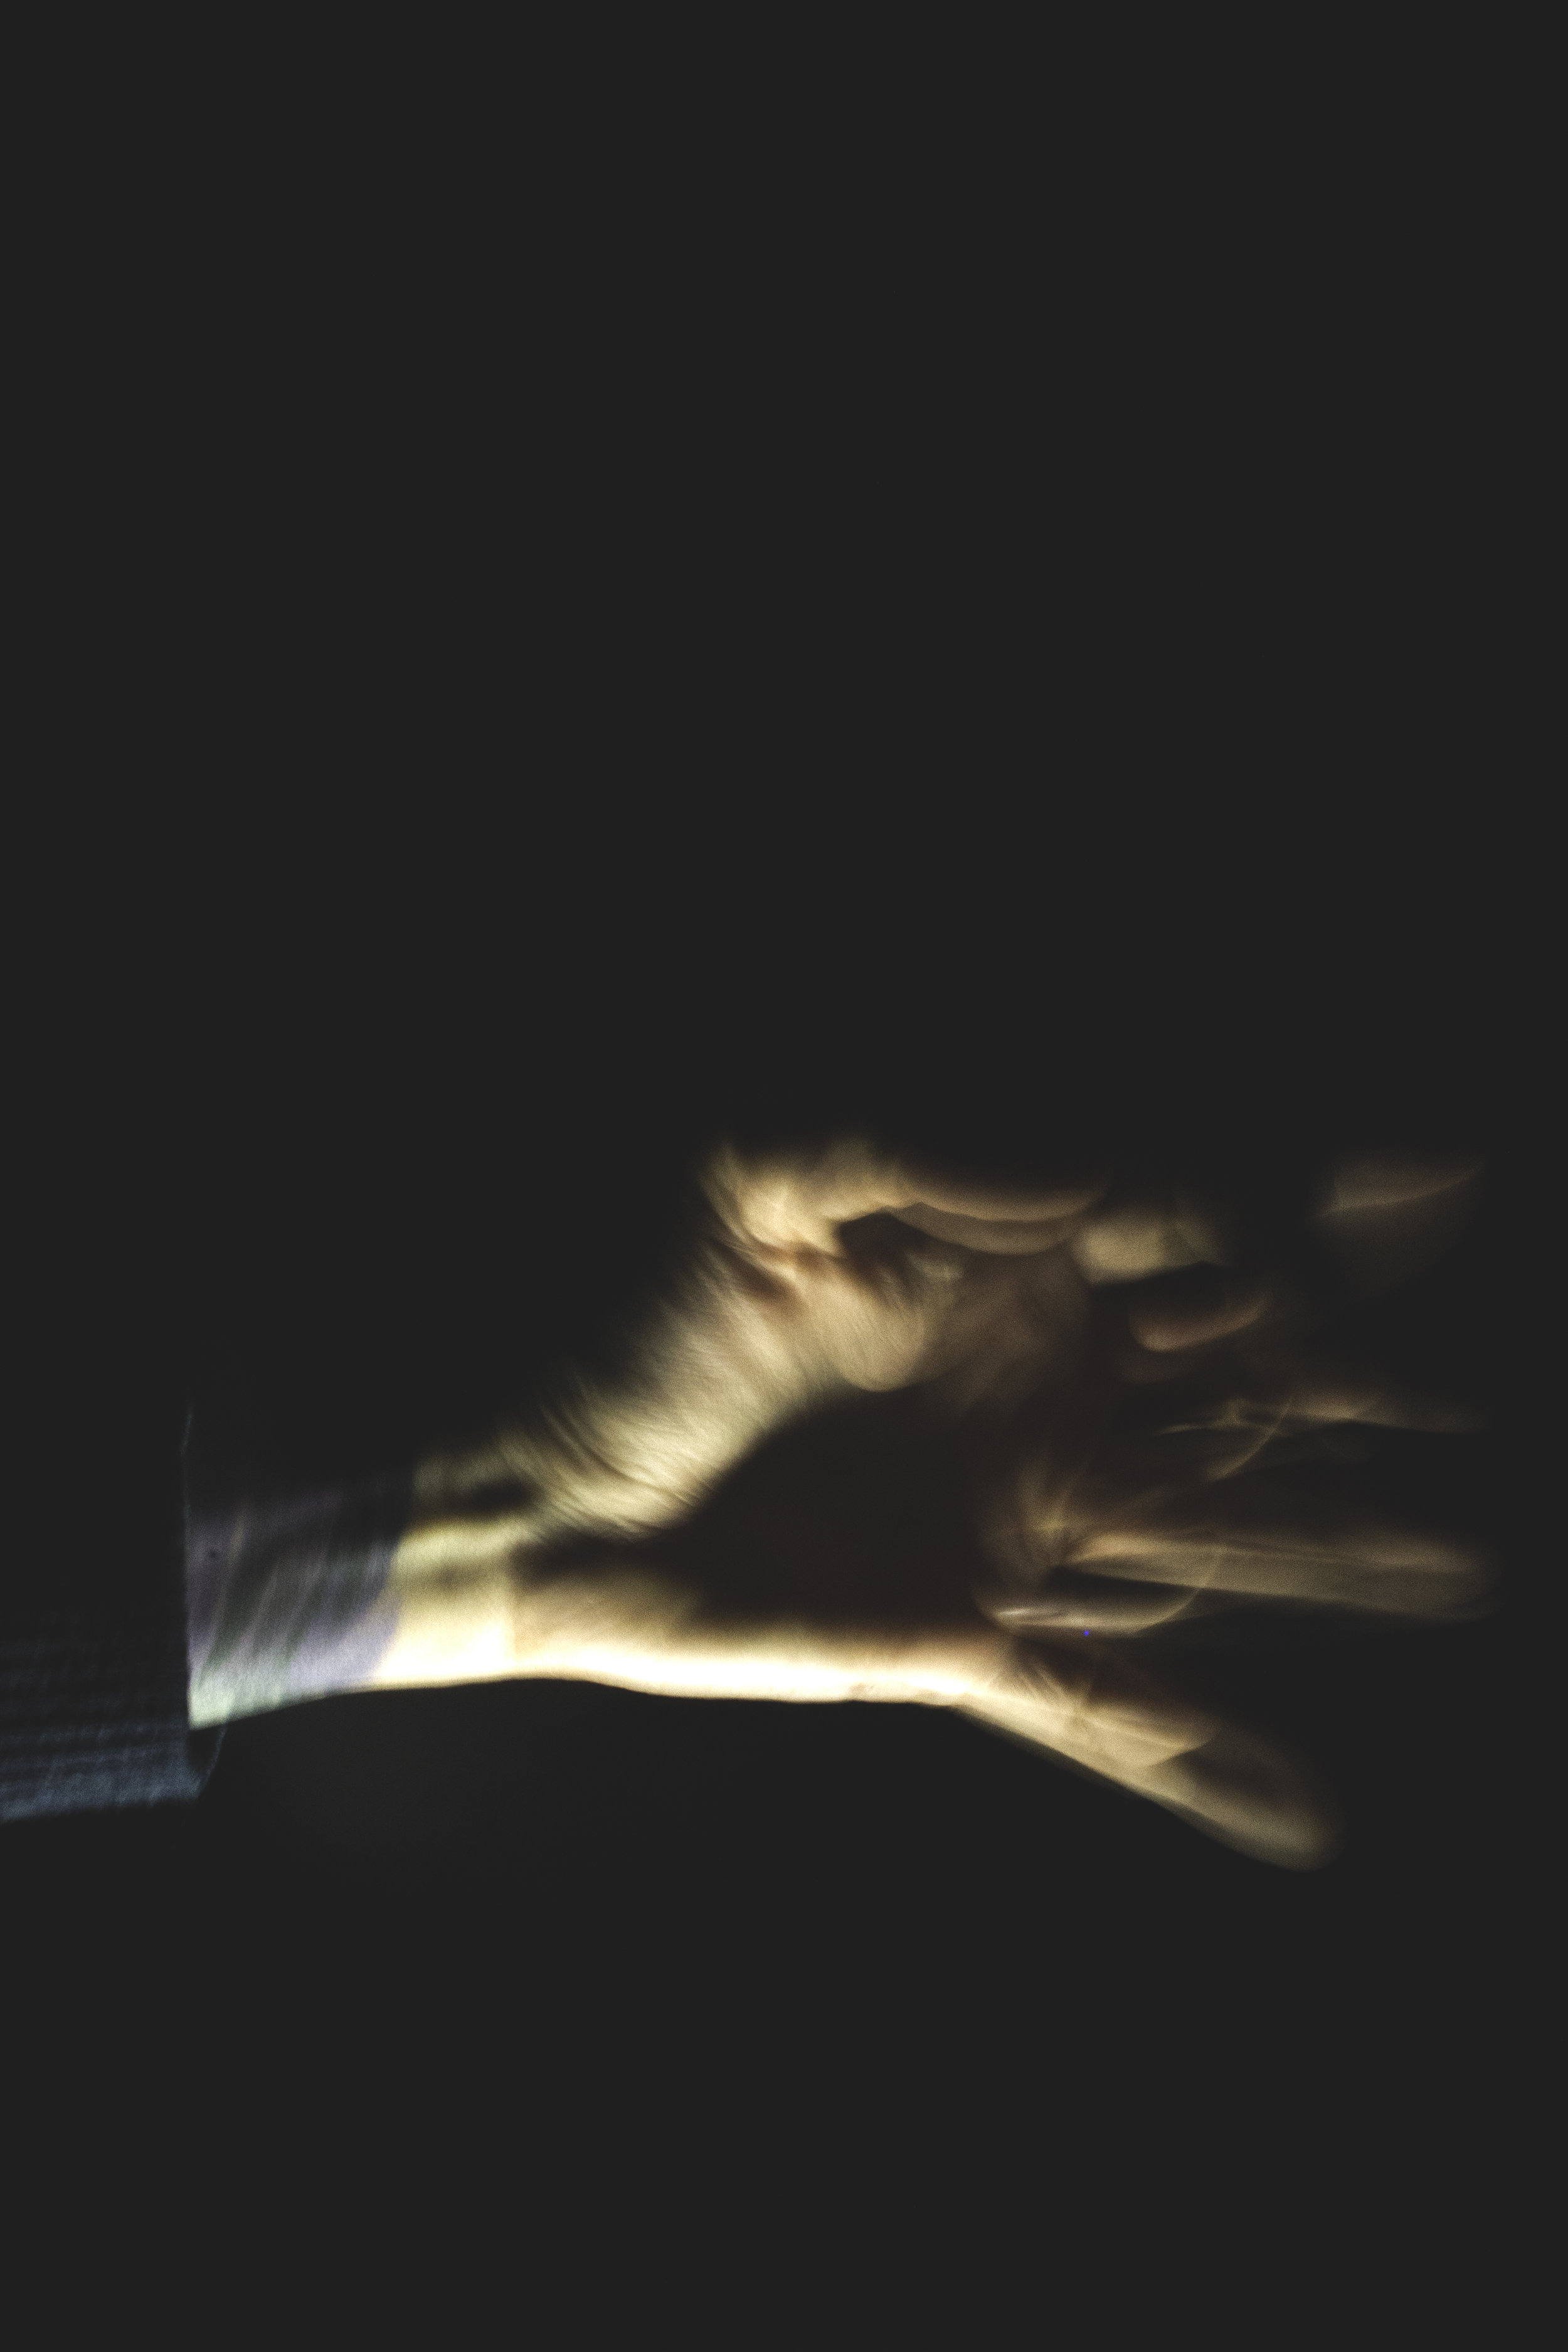 Hand_0002.jpg